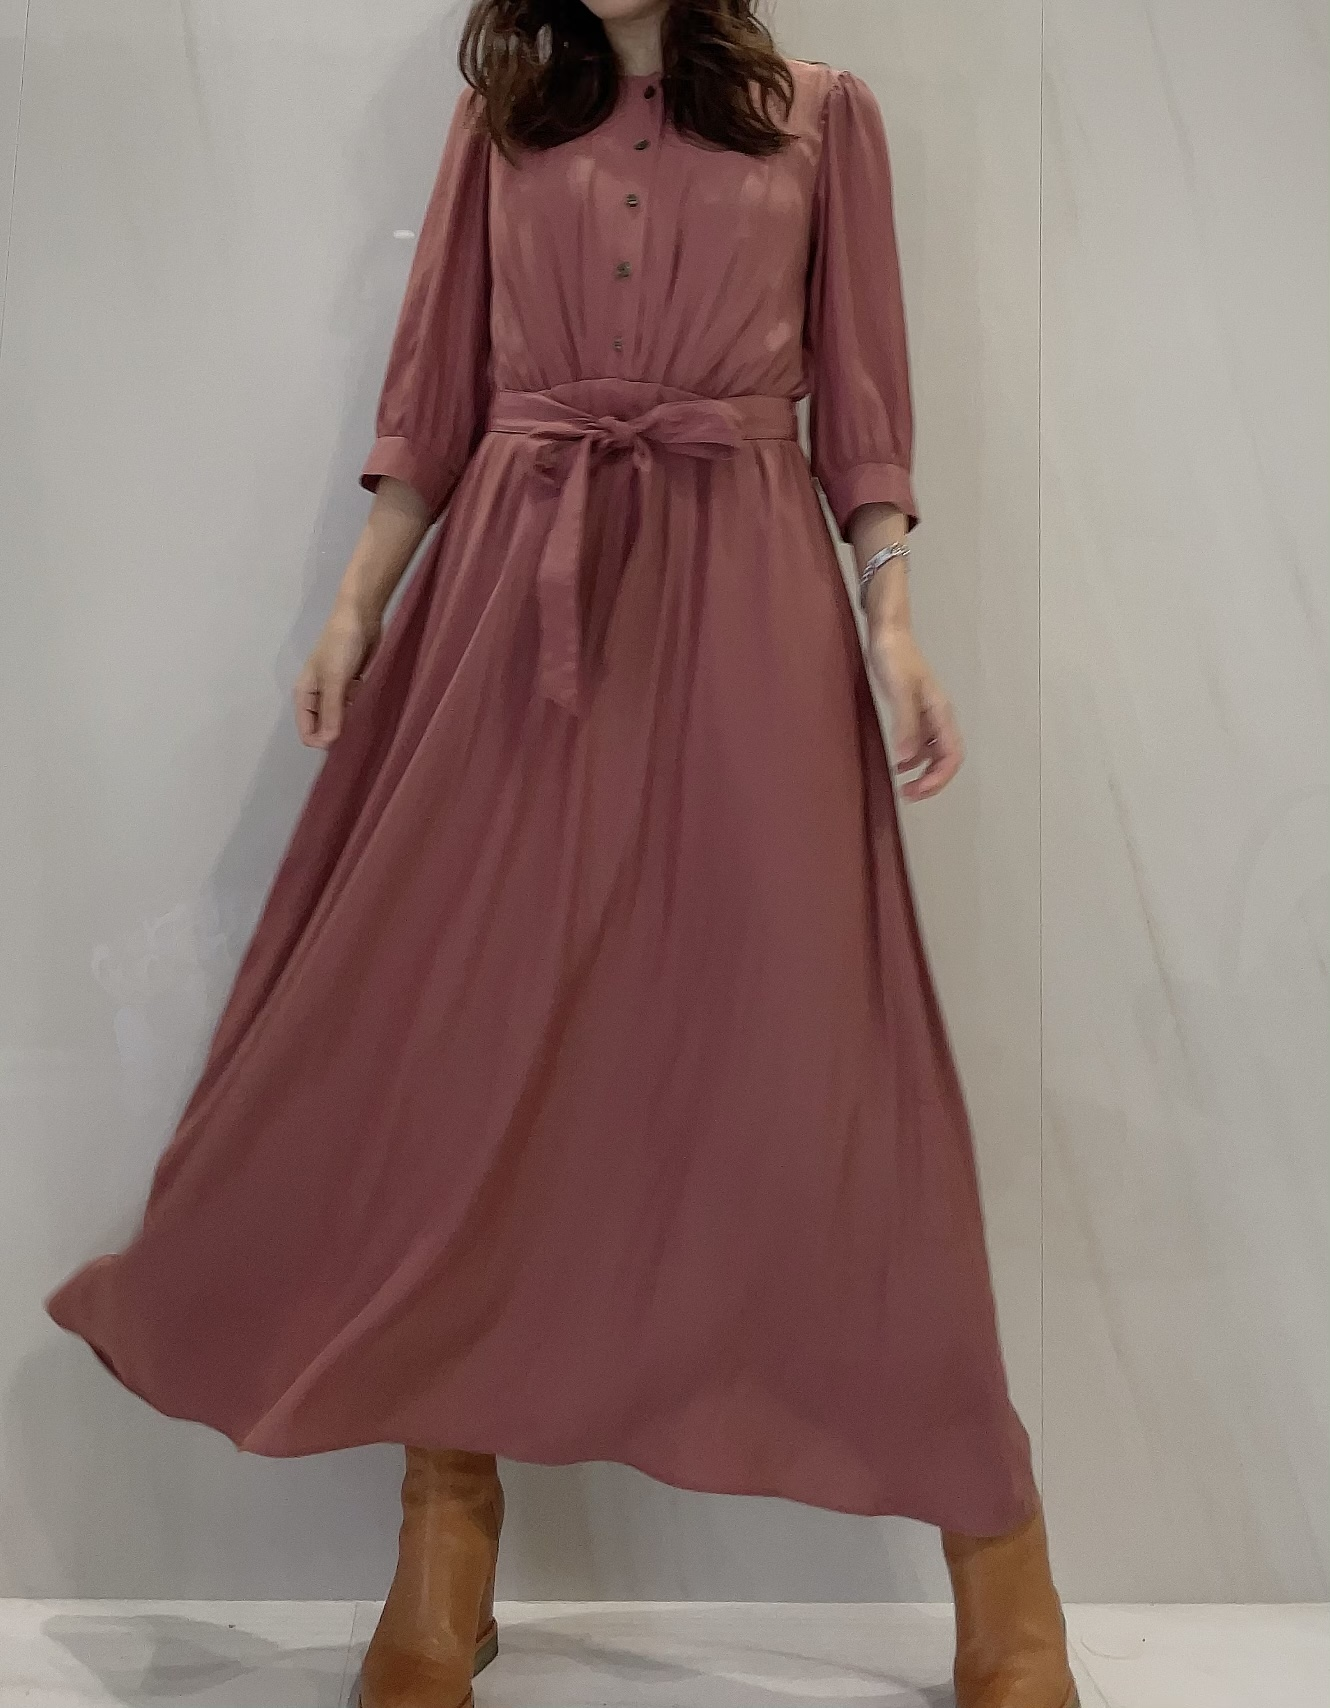 【selva secreta】FRONT BUTTON DRESS(pink-beige)